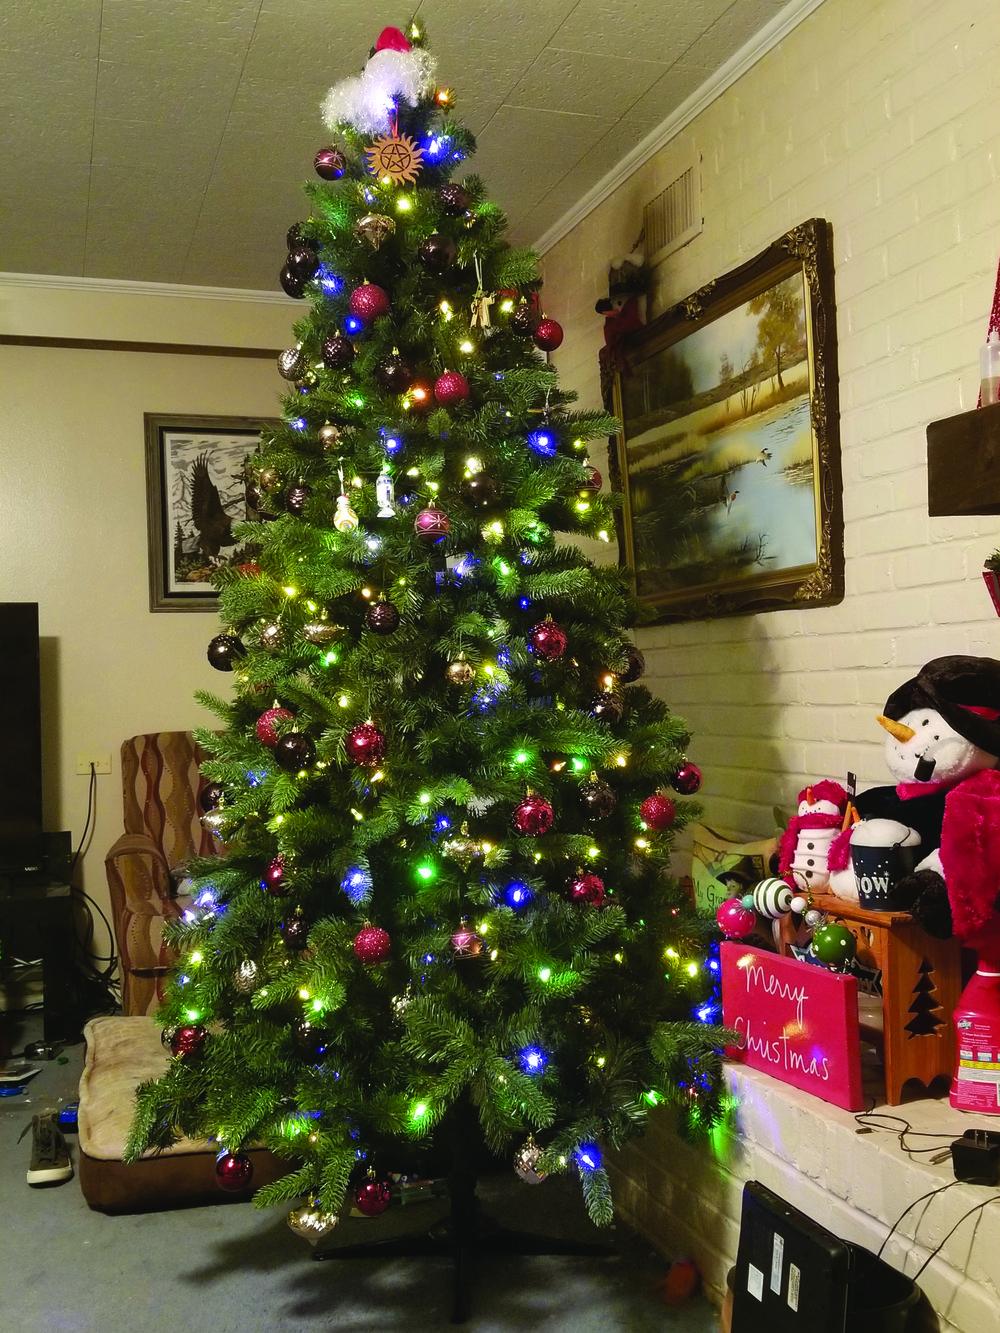 Ninja Turtle Christmas Tree.Christmas Trees And Their Decorations Have Evolved